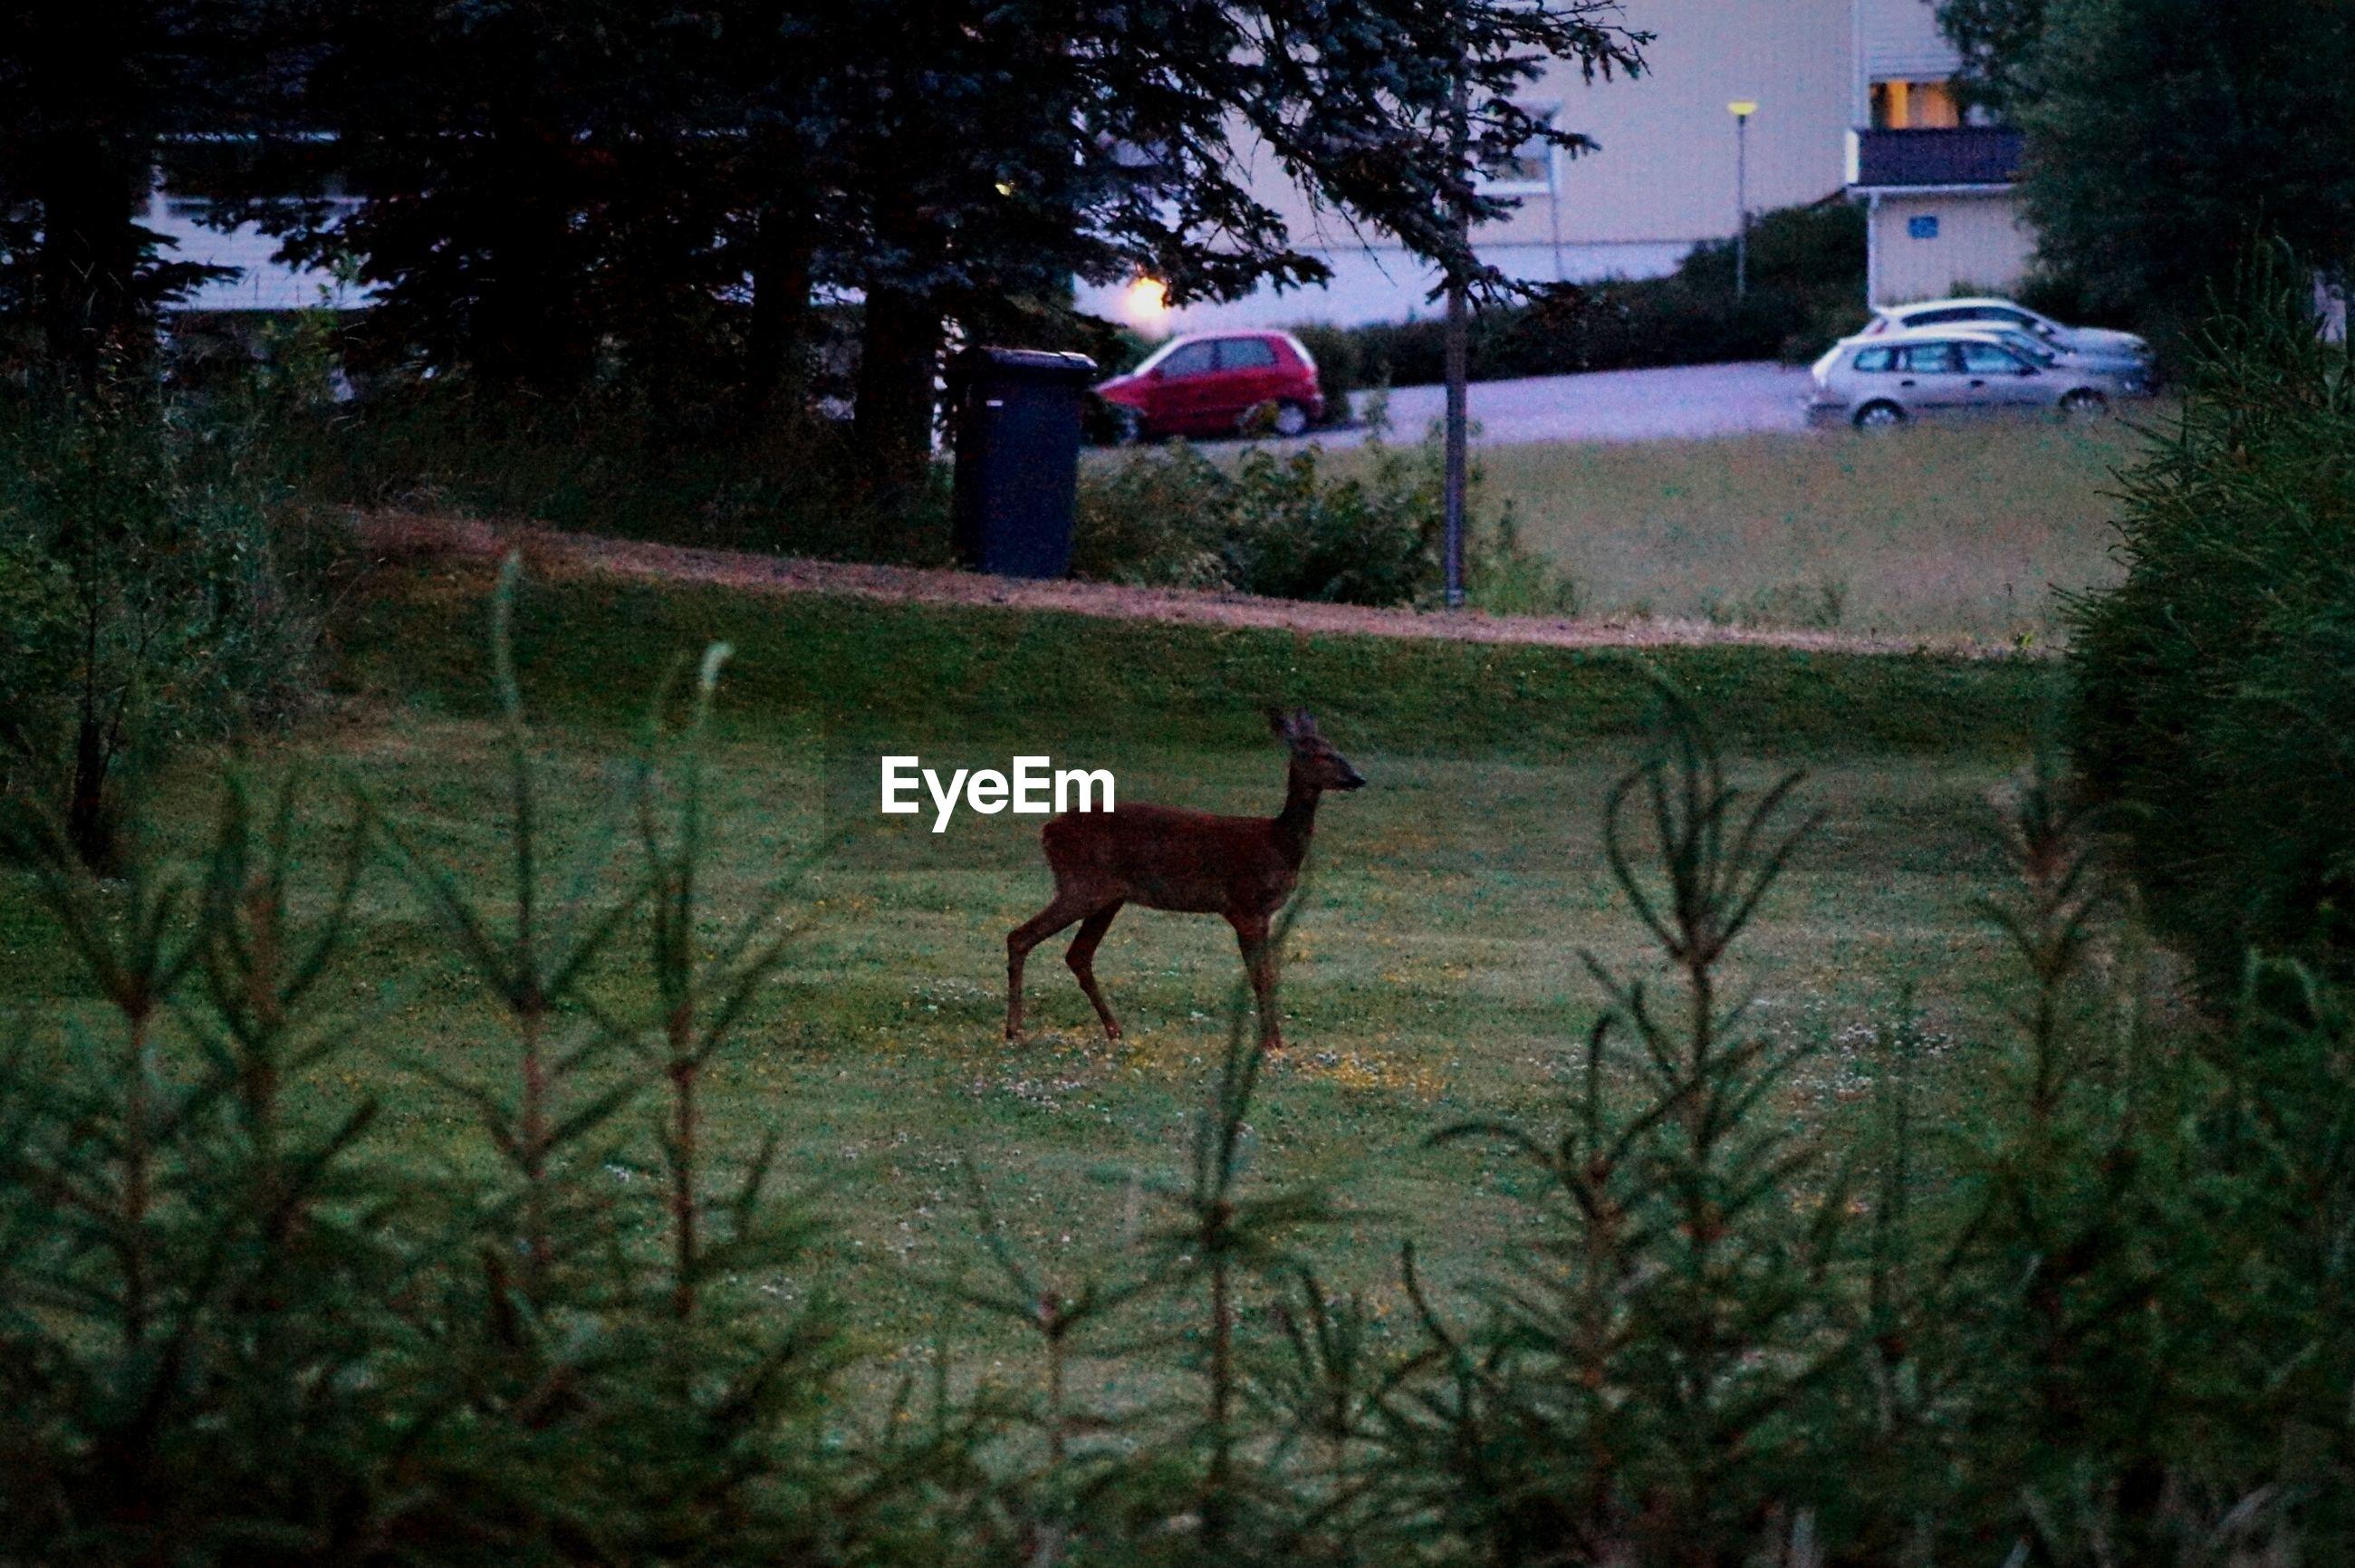 Deer on grass at park